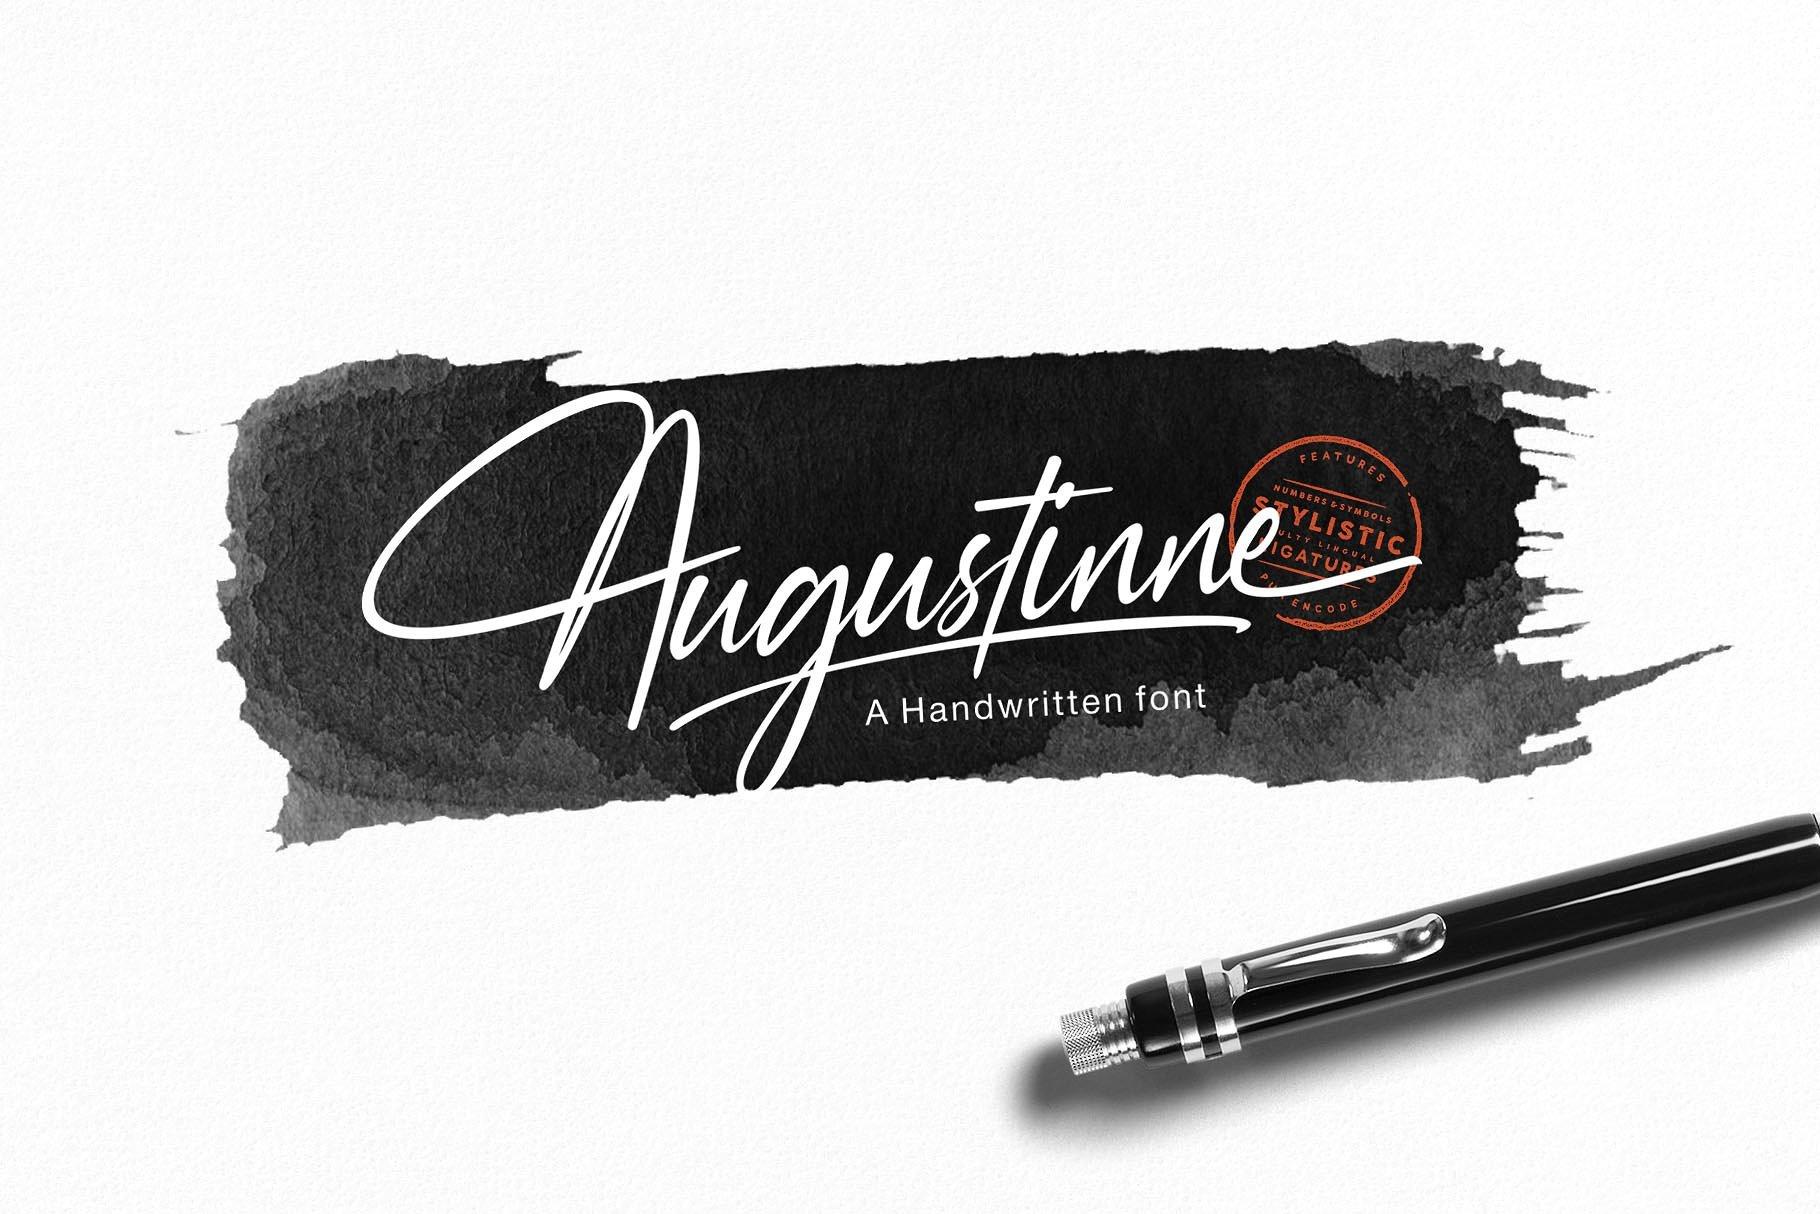 https://fontclarity.com/wp-content/uploads/2019/09/augustinne-handwritten-font-download-0.jpg Free Download